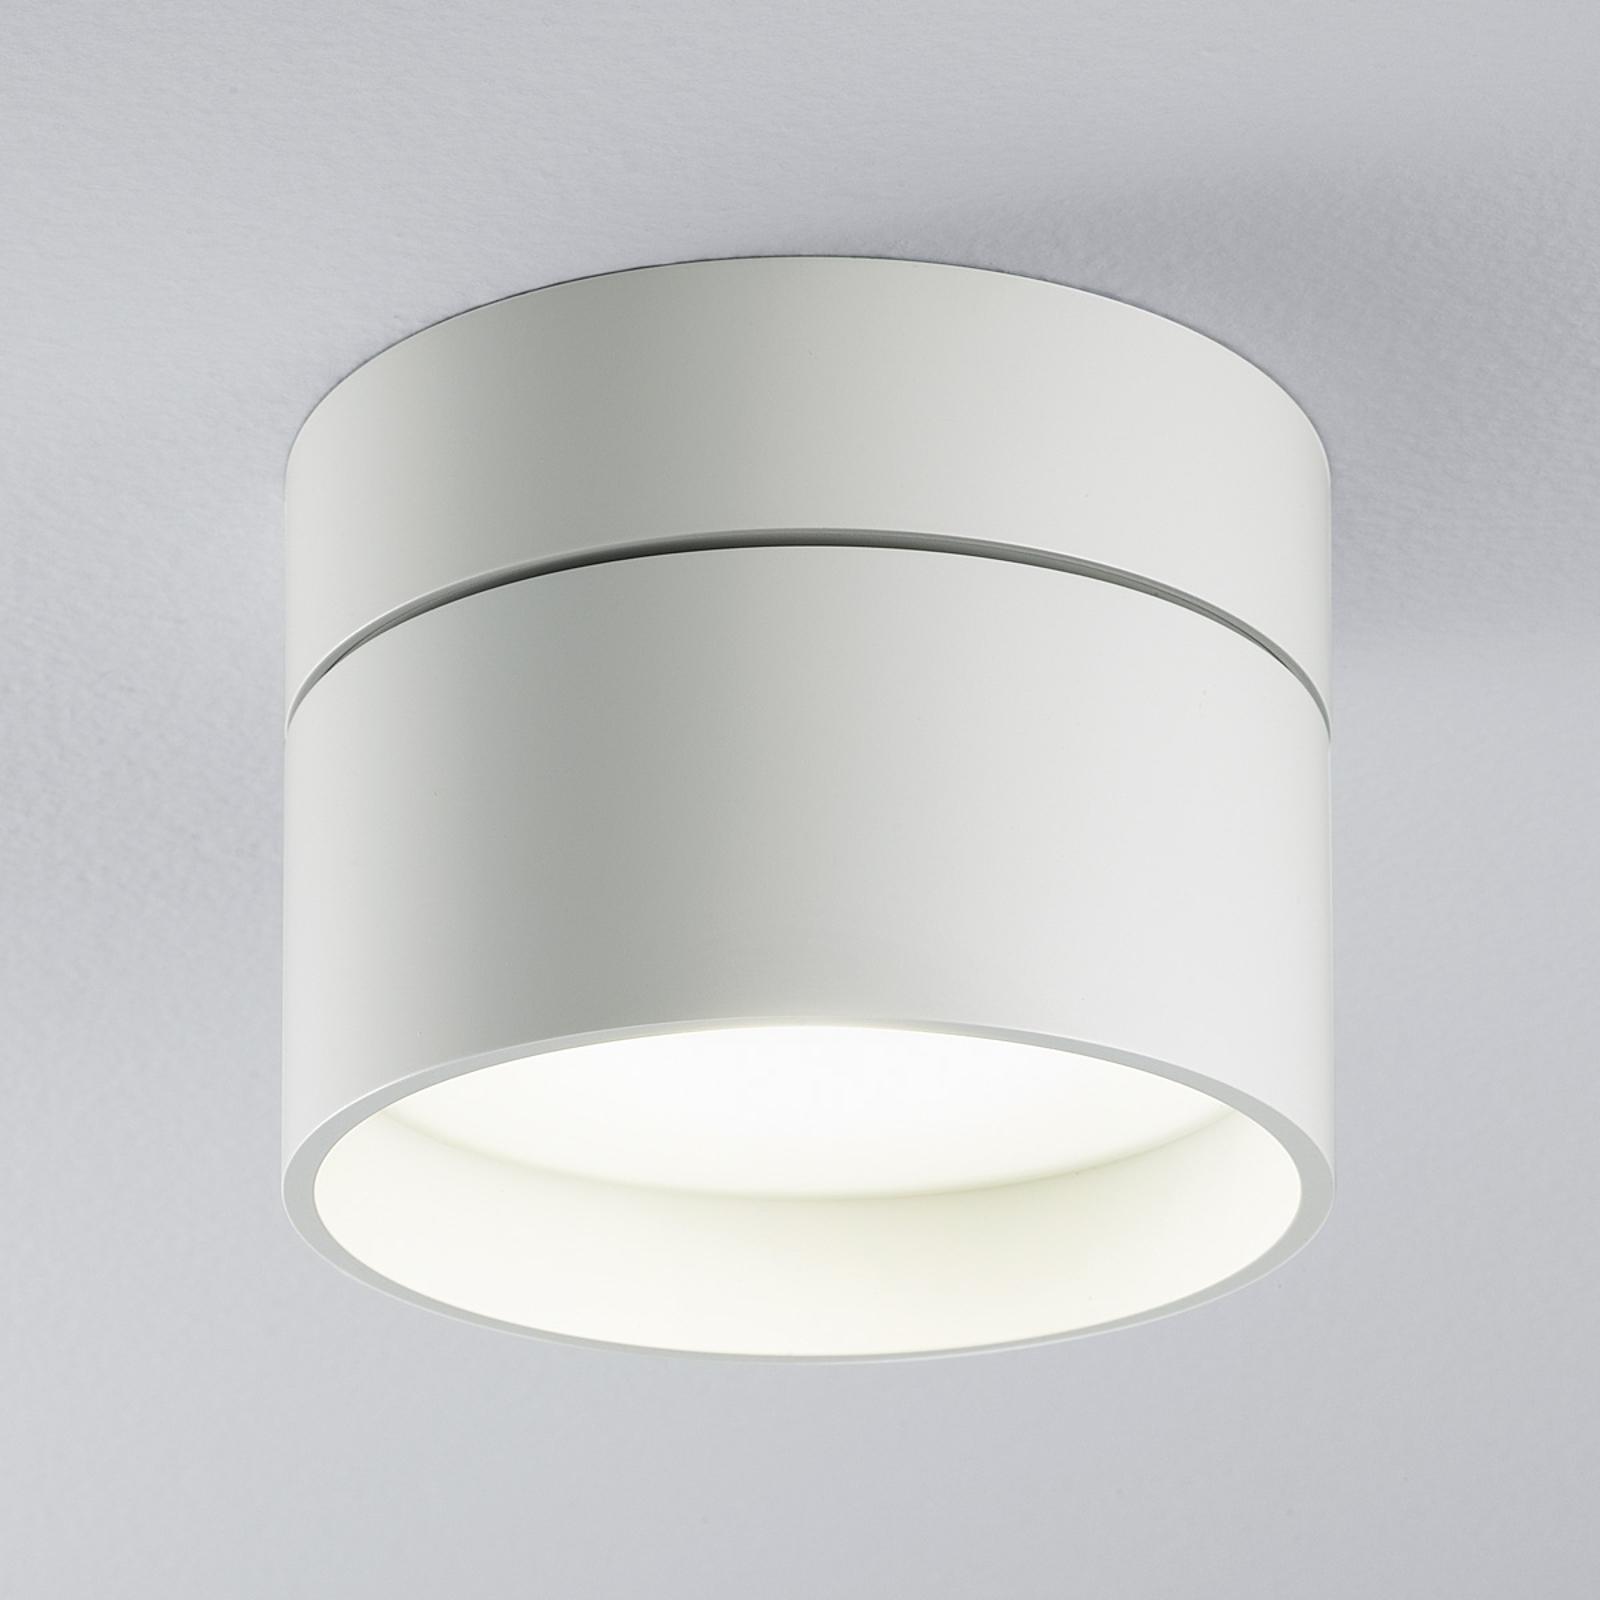 Plafonnier LED Pipe, 11cm